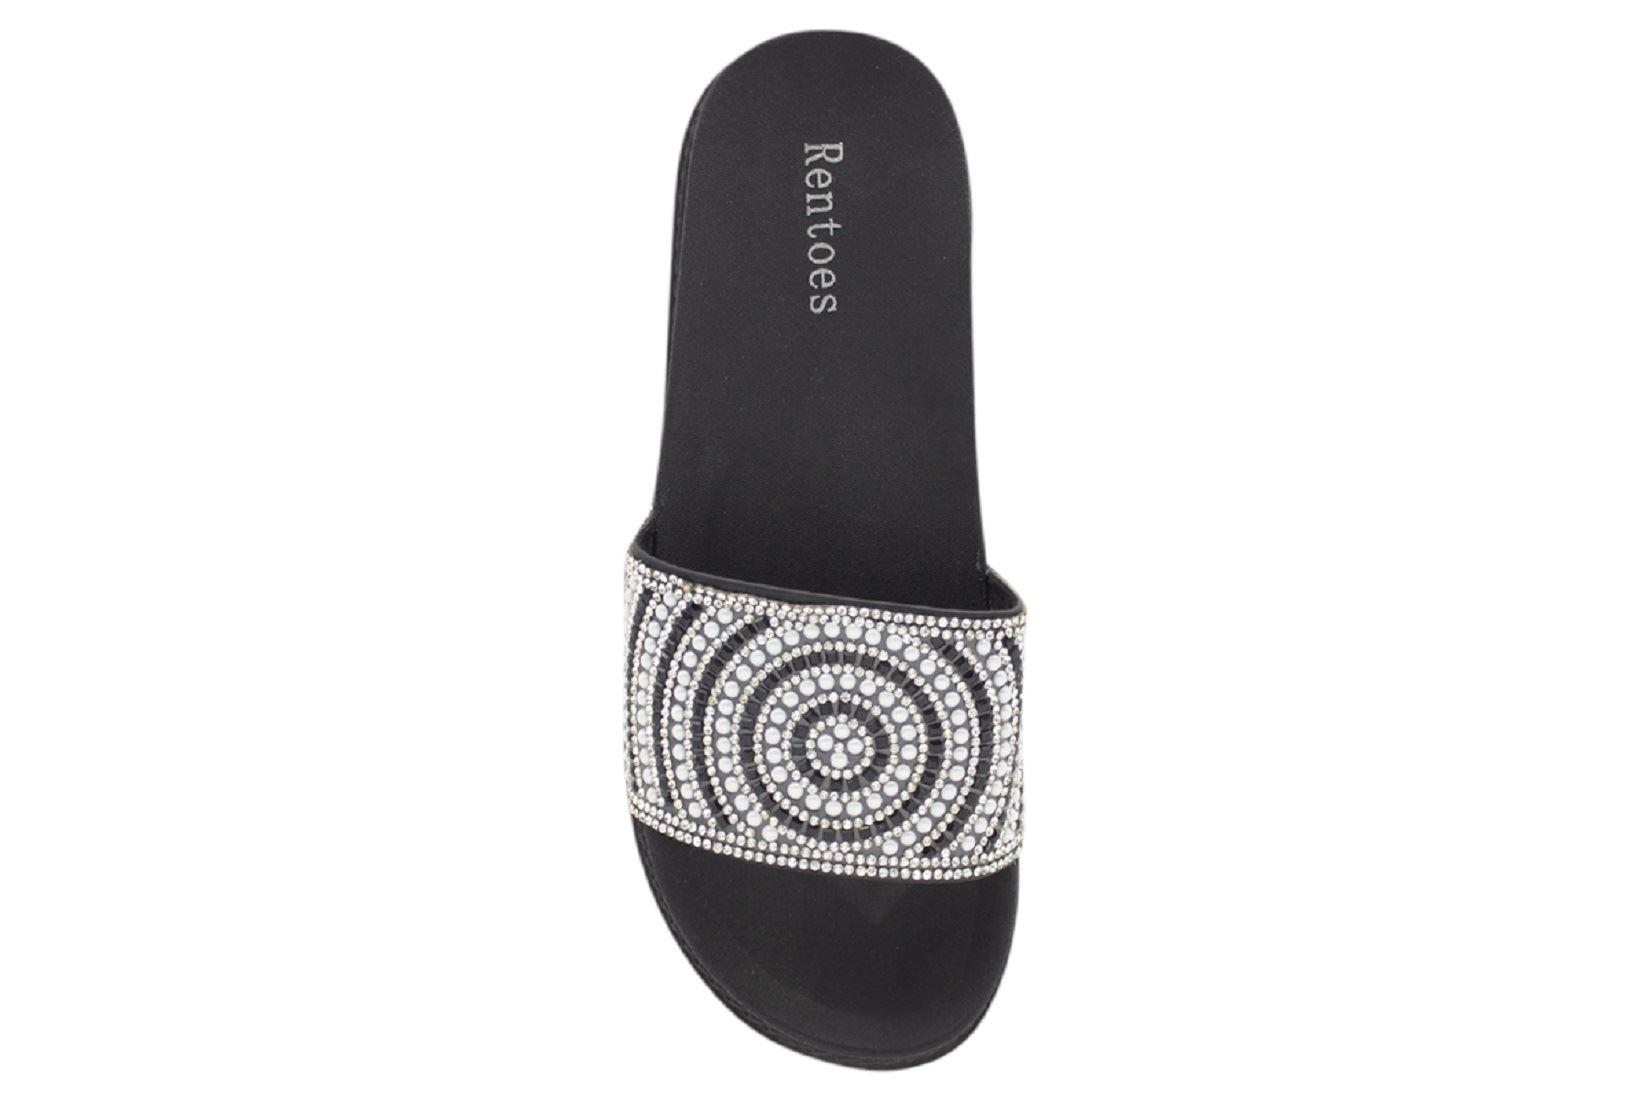 Womens-Sliders-Casual-Slippers-Mules-Ladies-Diamante-Flip-Flop-Sandals-Shoes thumbnail 104